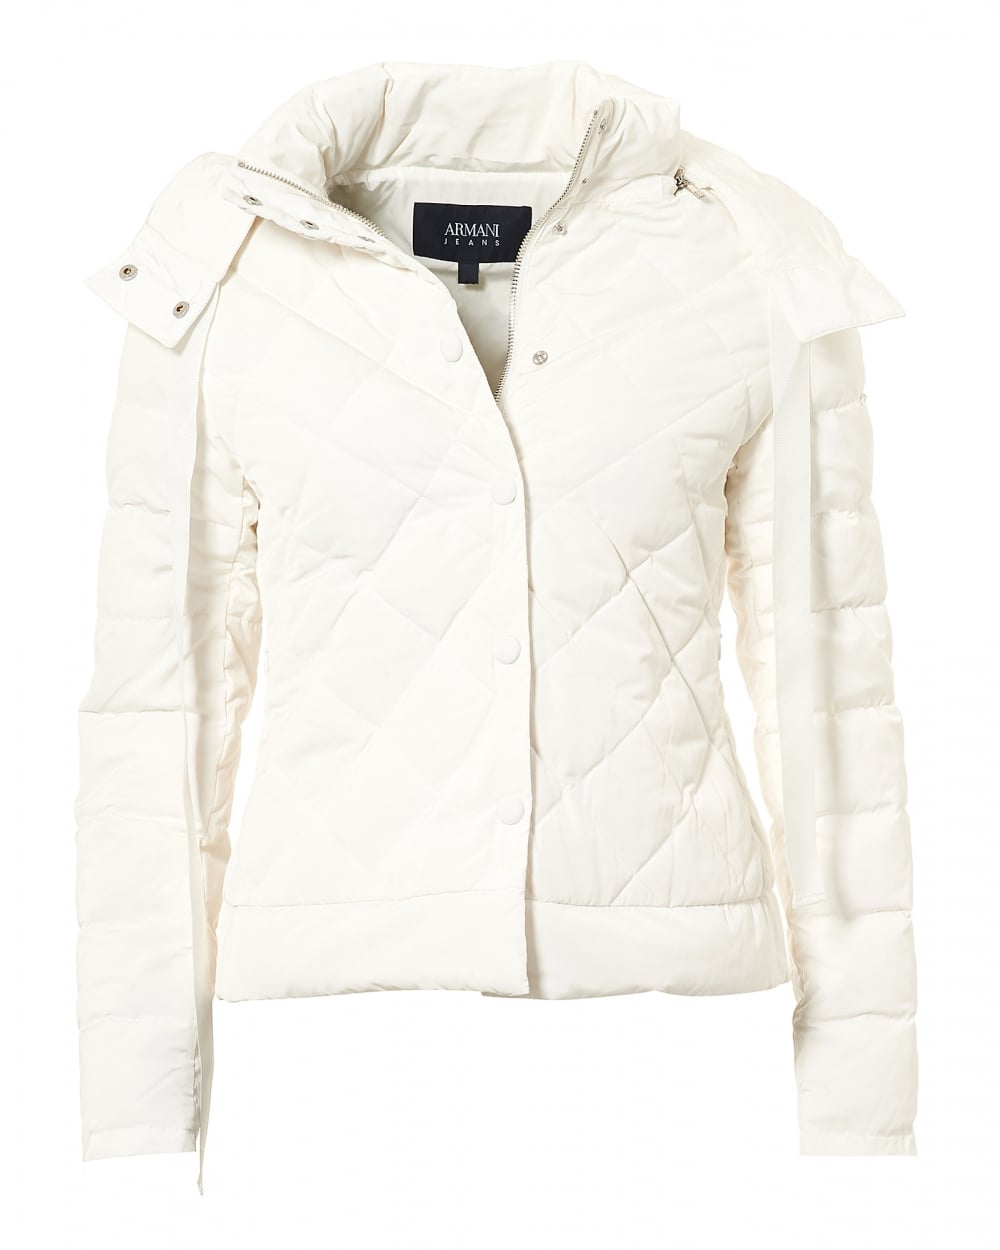 Armani Jeans Womens Short Puffa Jacket Diamond Quilt